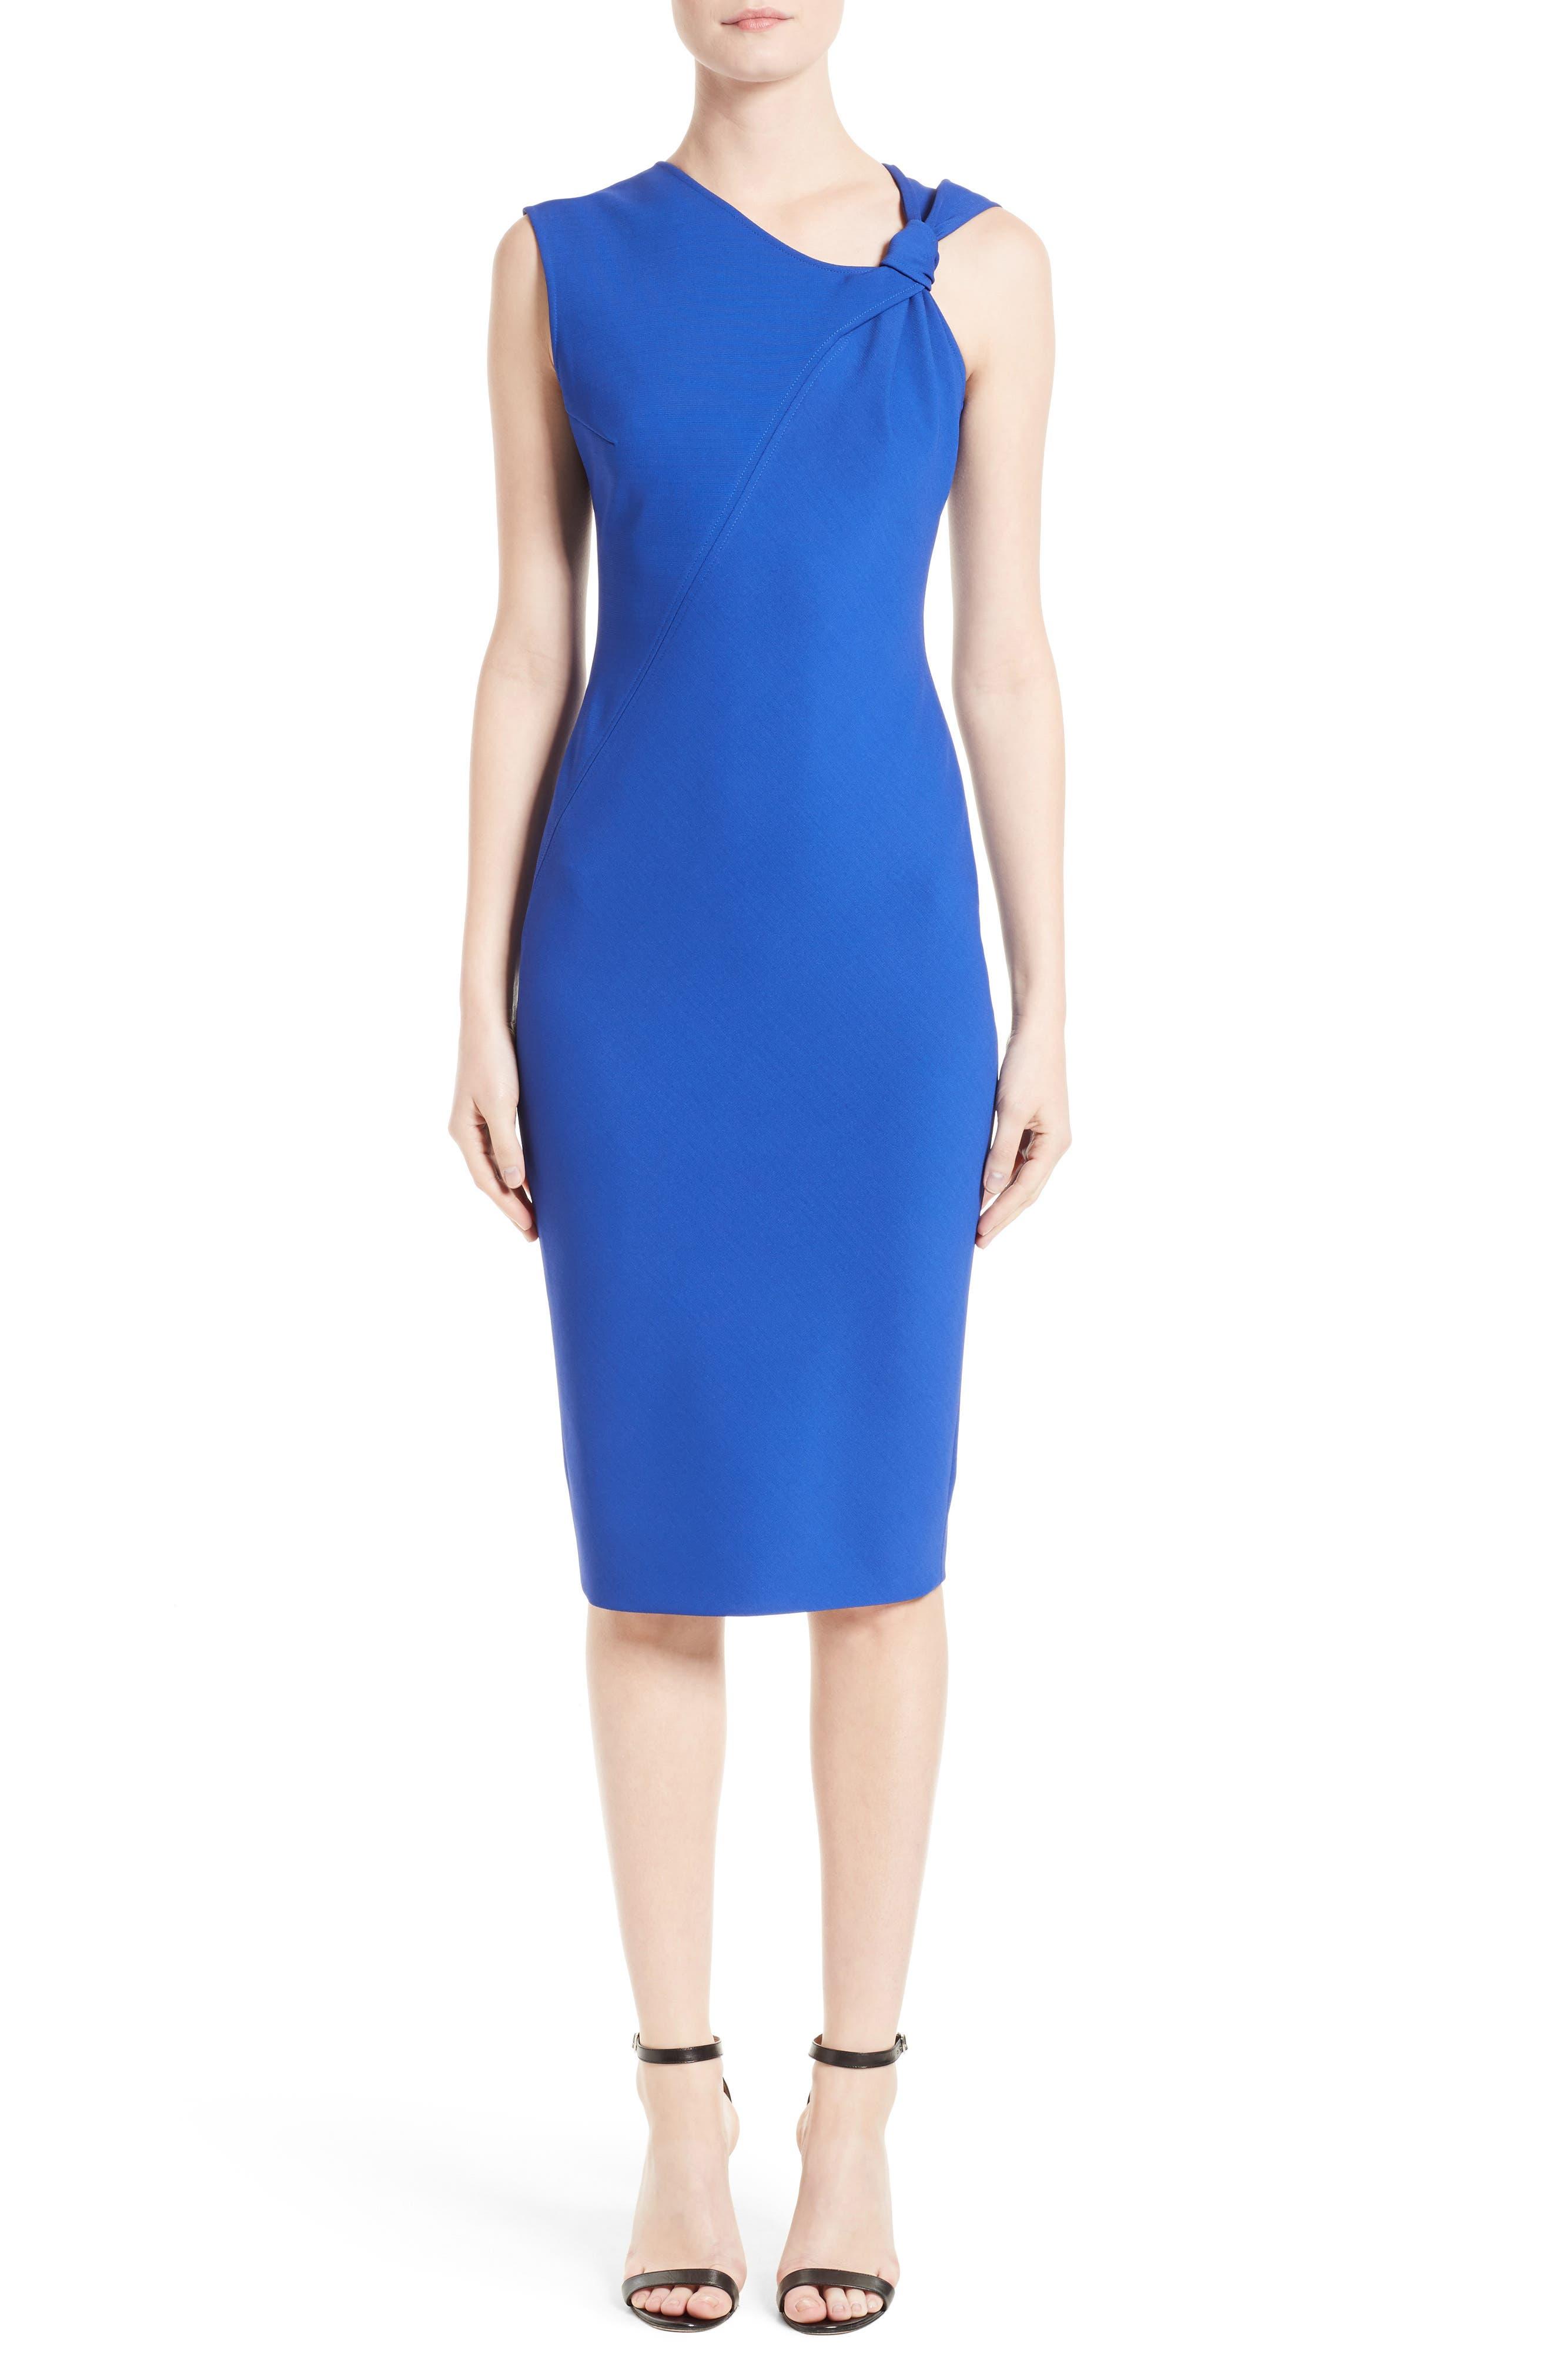 Victoria Beckham Knotted Rib Jersey Dress